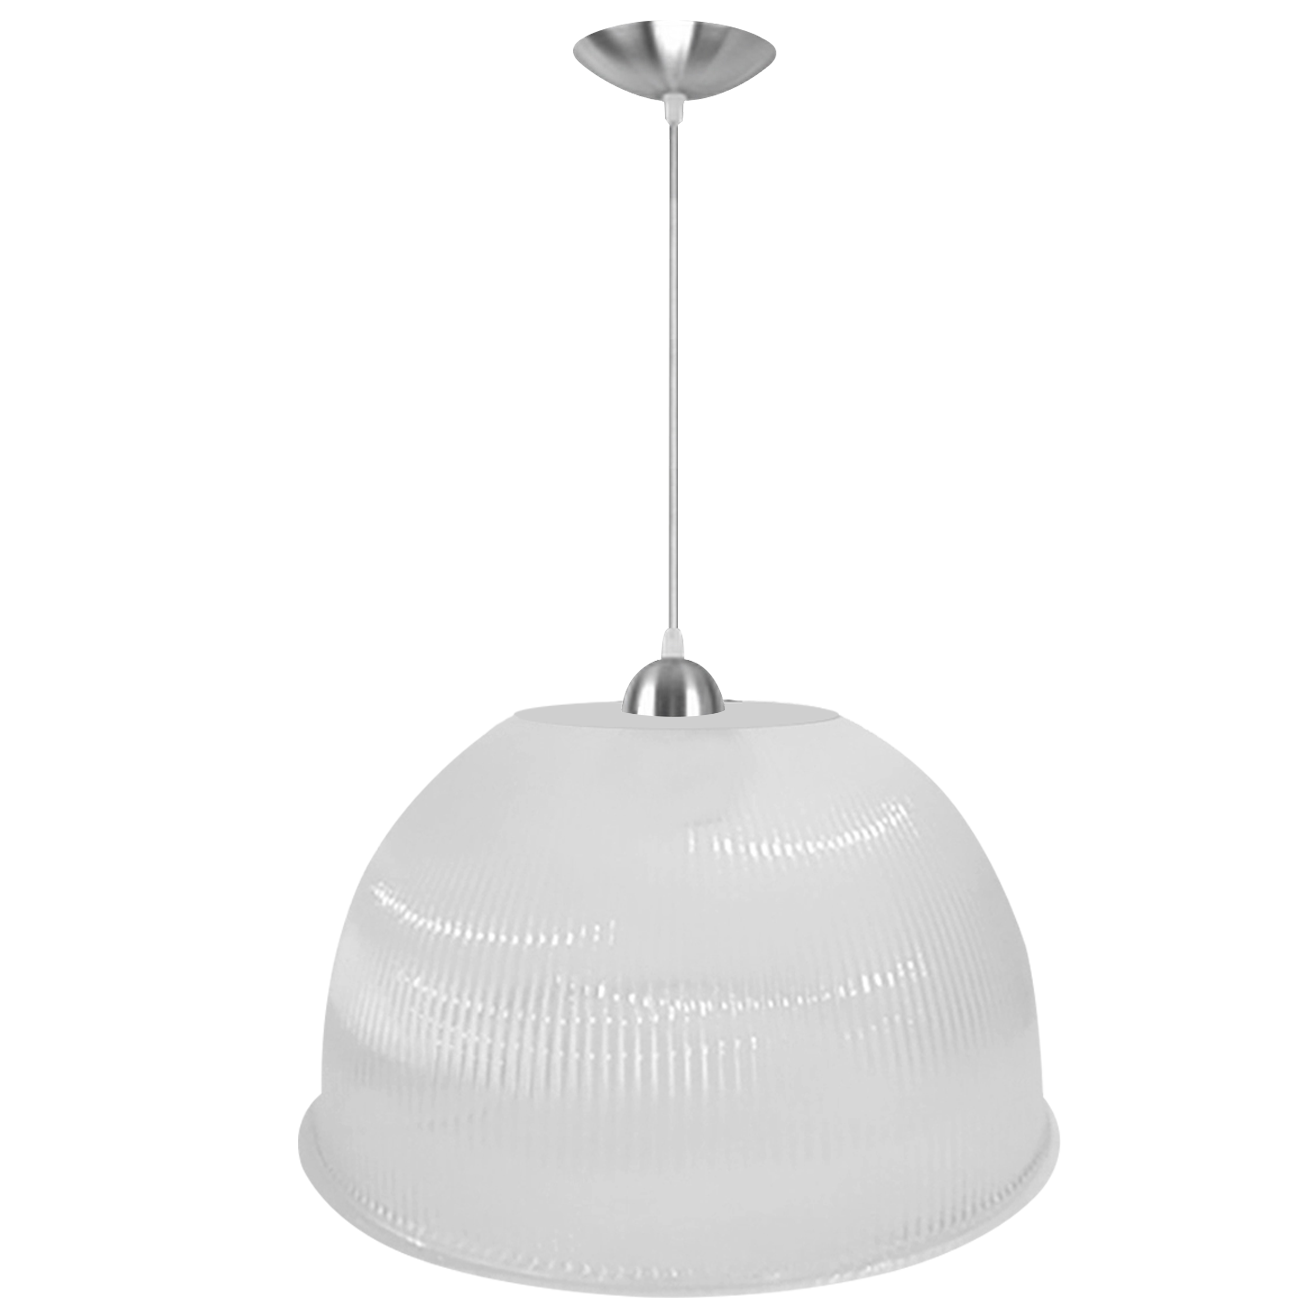 Pendente Prismática 22 Pol Branca Leitosa Acabamento Alumínio Soquete E27 - L01-22BL/AL